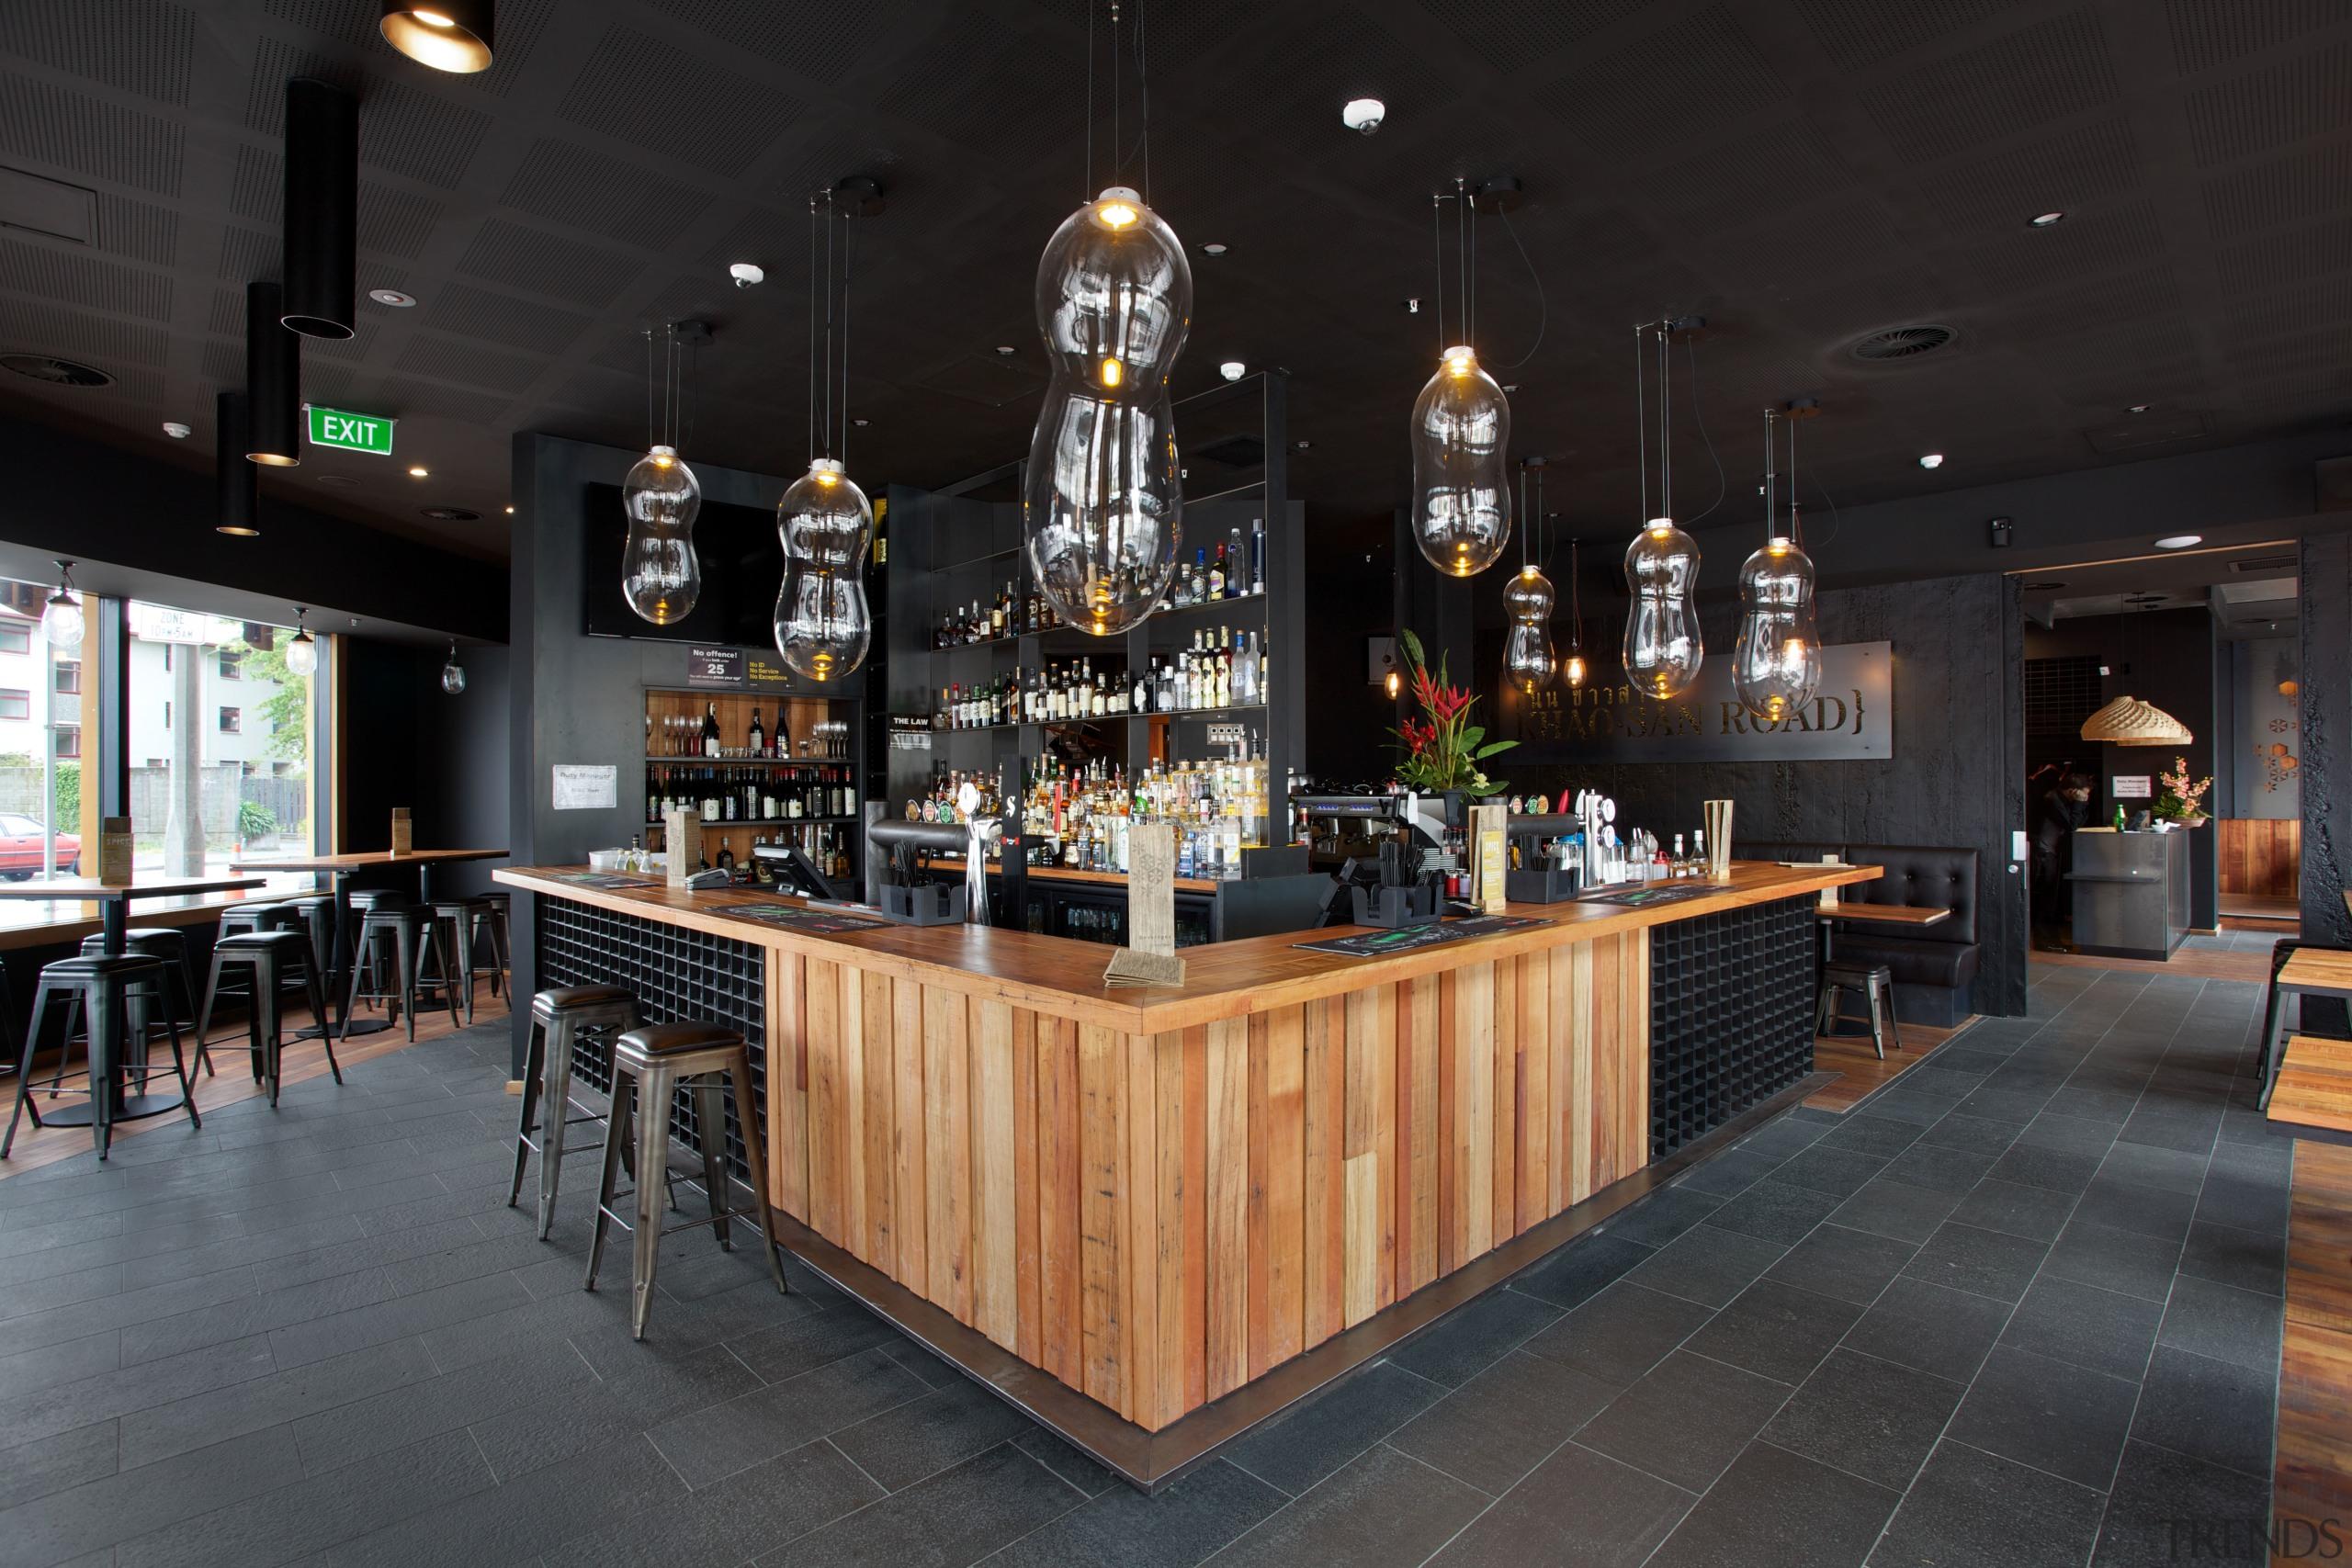 The Spice Paragon Thai fusion restaurant and Khao-San bar, interior design, liquor store, restaurant, black